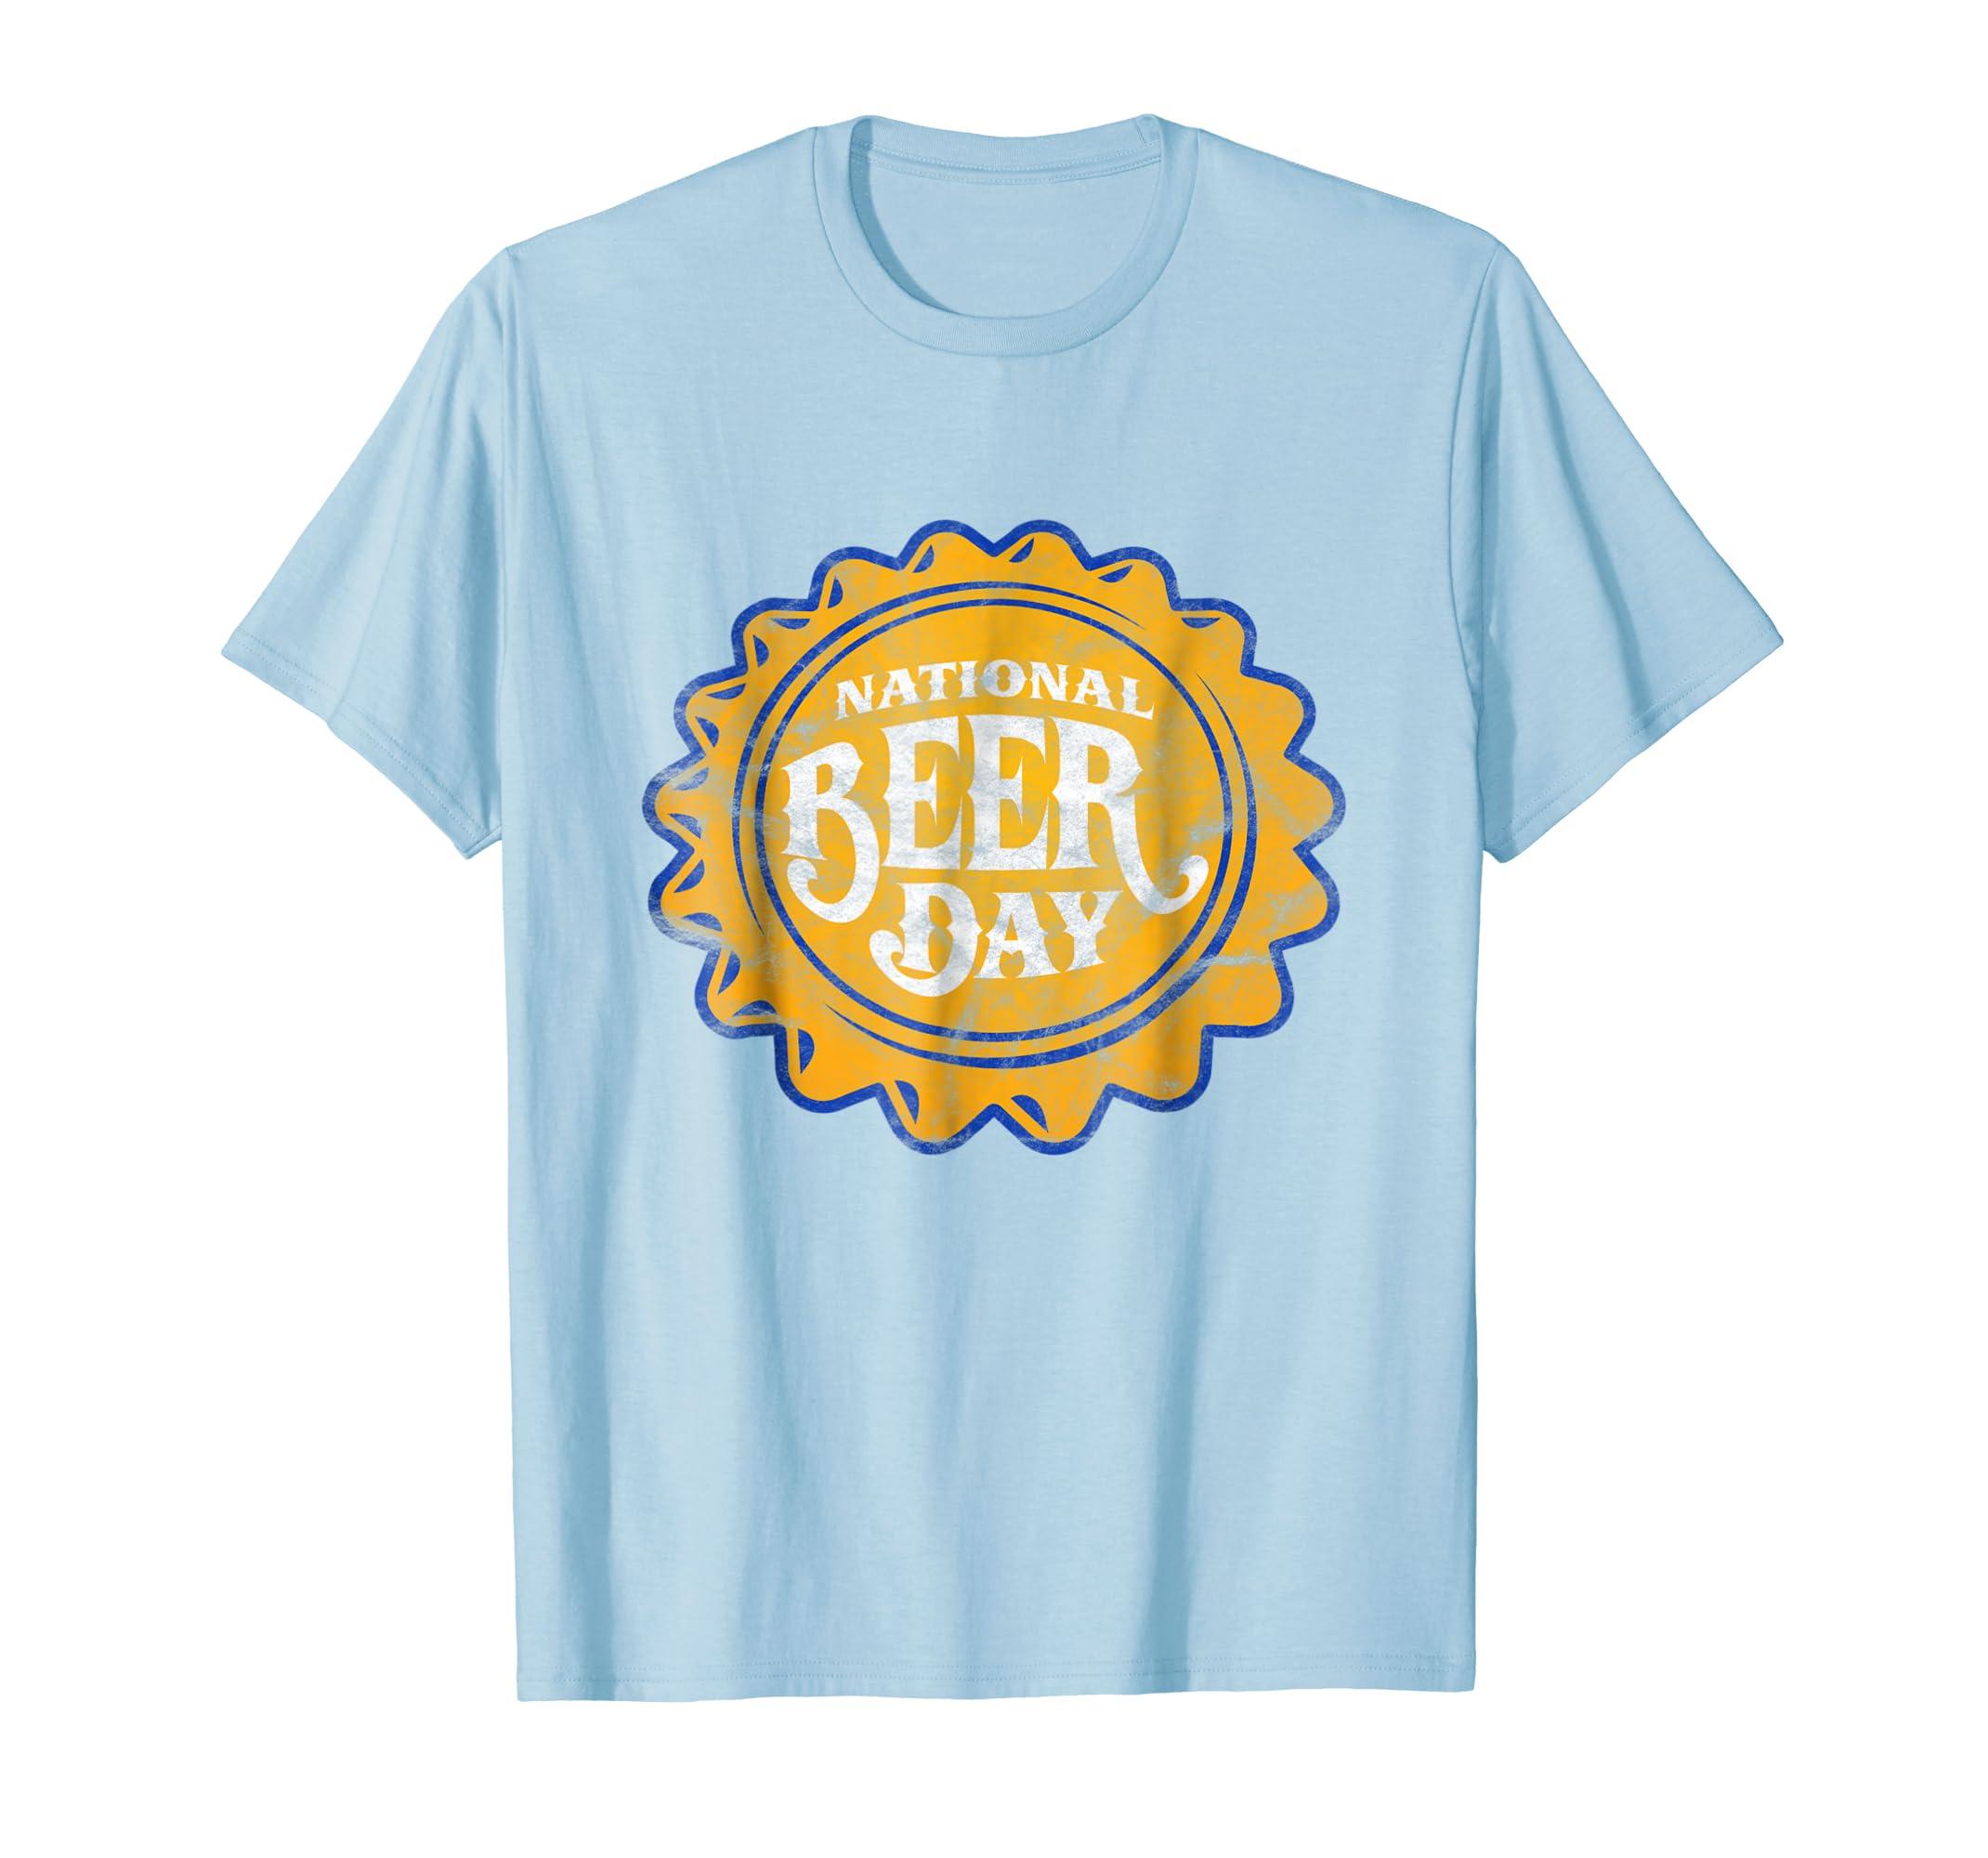 'National Beer Day' International Beer Day Shirt-AZP